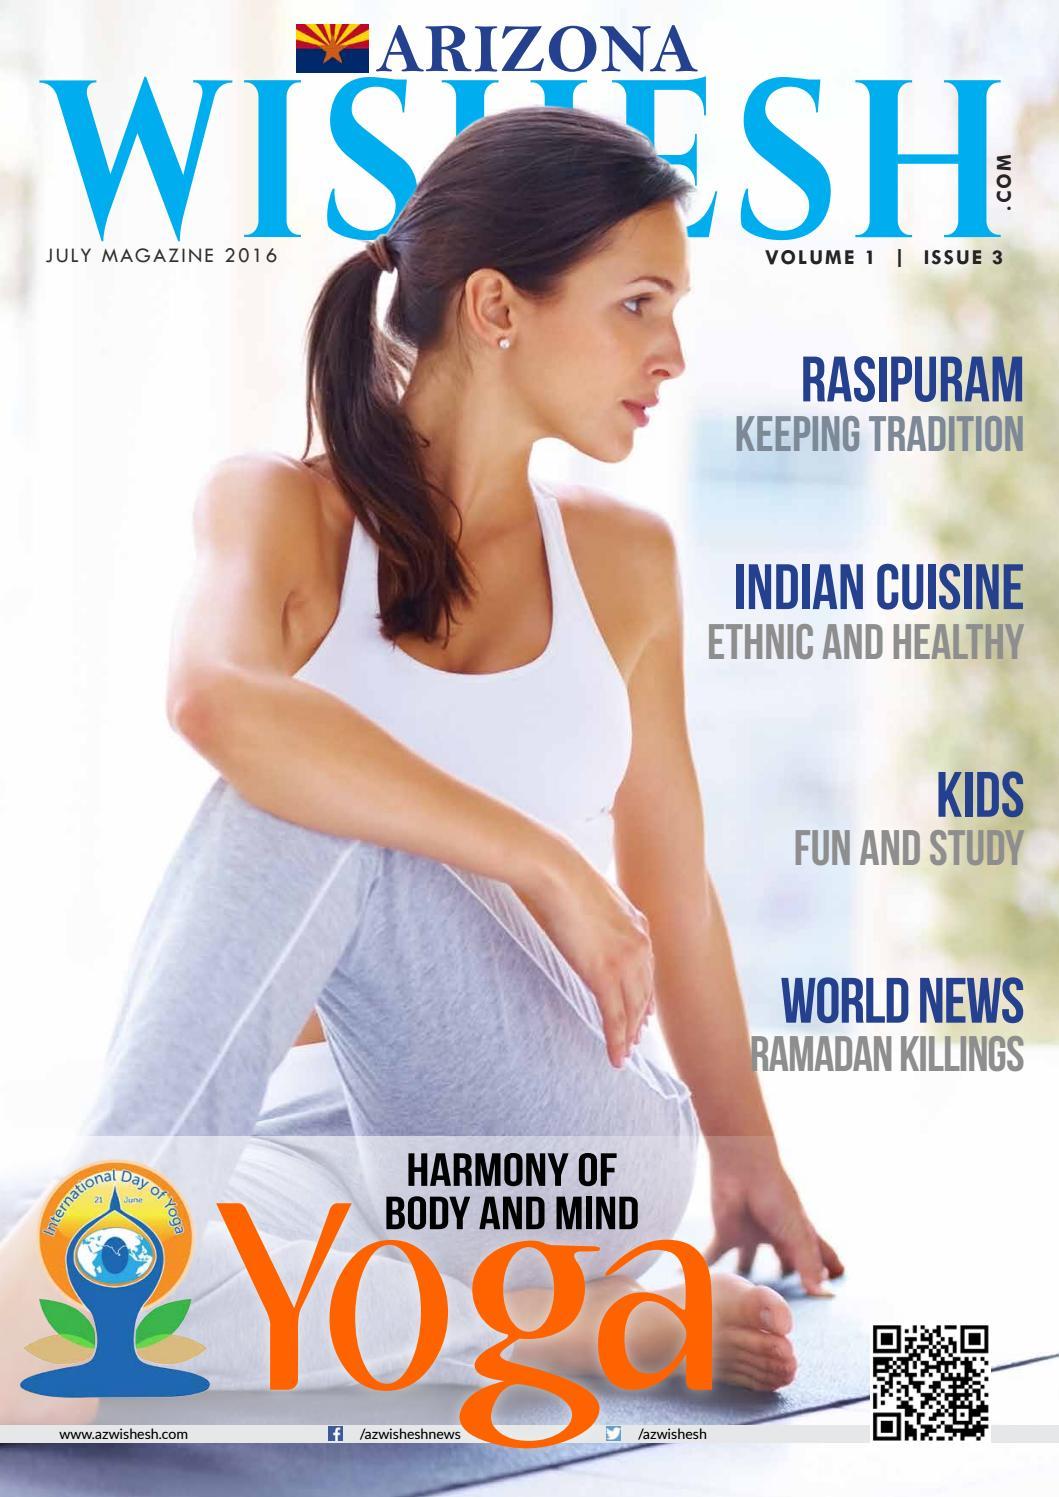 AZWishesh Magazine July 2016 by Wishesh Magazine - issuu